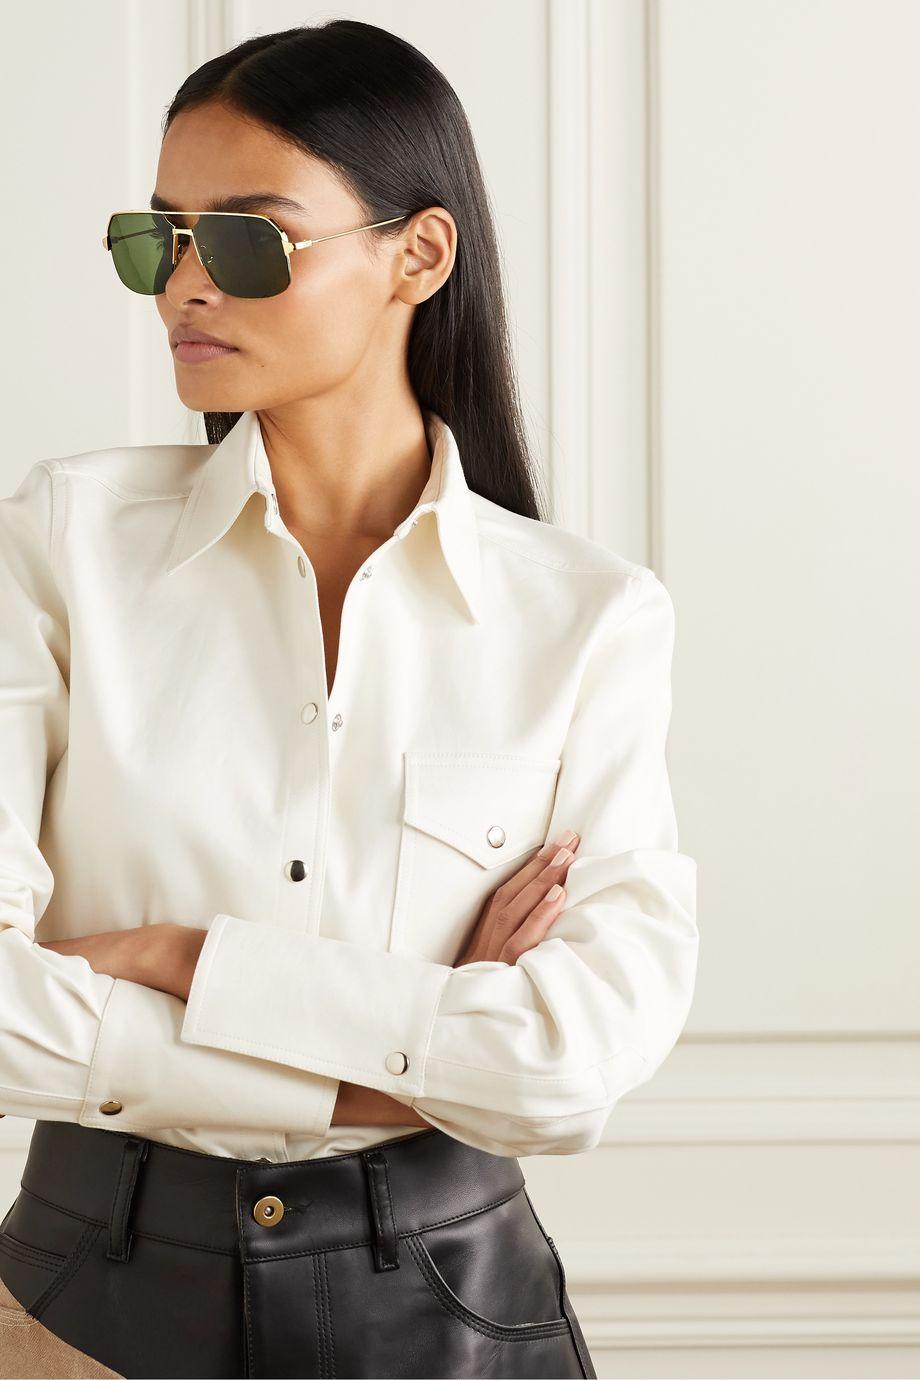 Cartier Eyewear Santos goldfarbene Pilotensonnenbrille